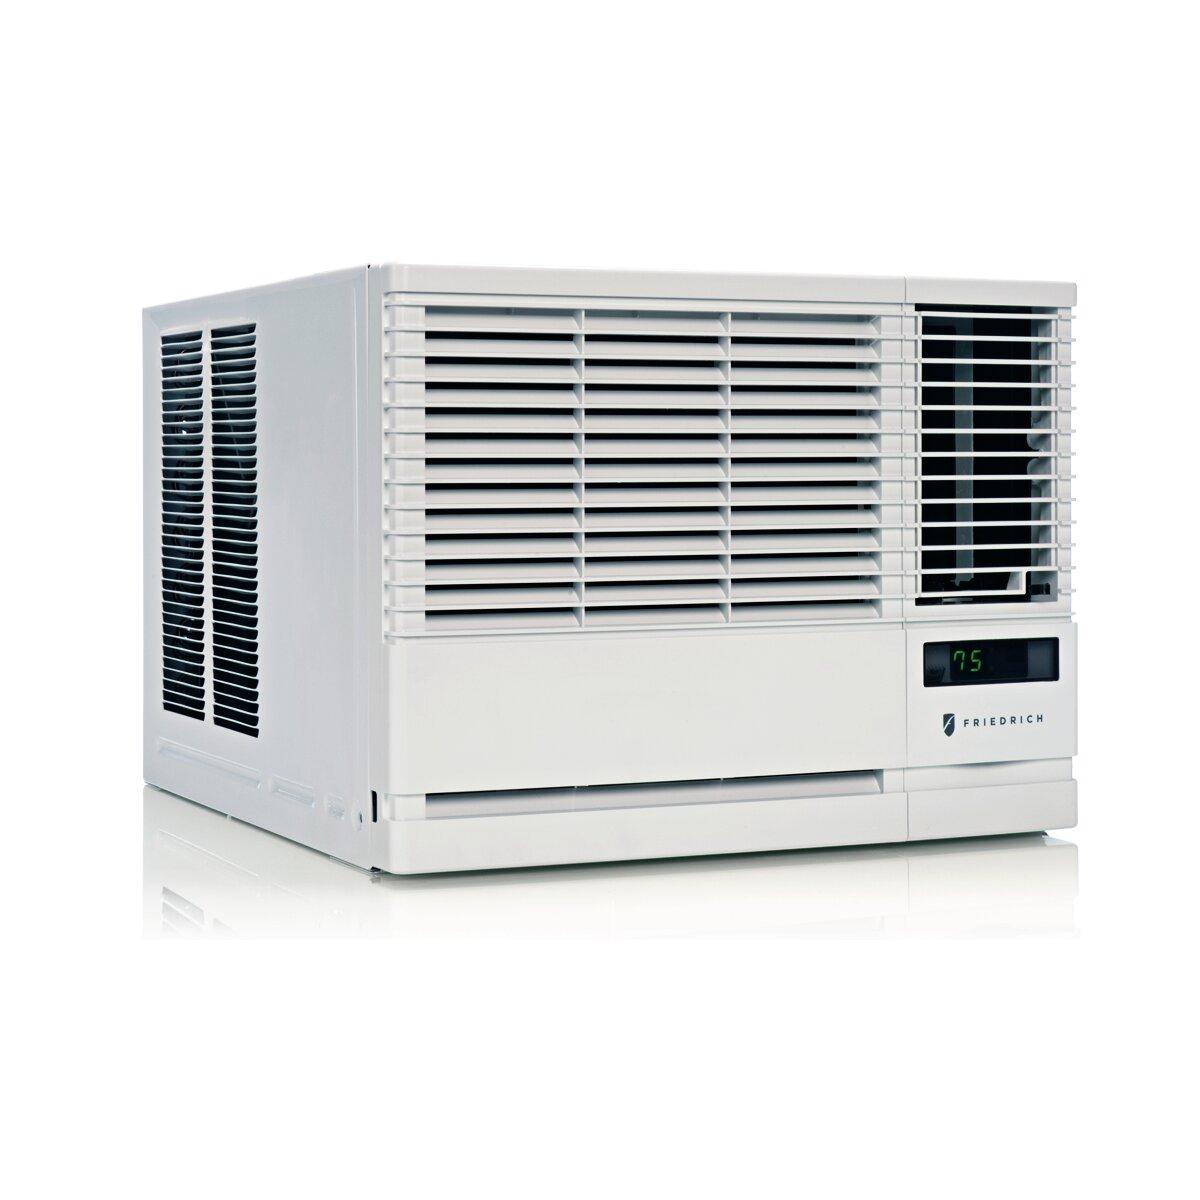 Chill 18000 17500 btu energy star window air conditioner for 18000 btu window air conditioners